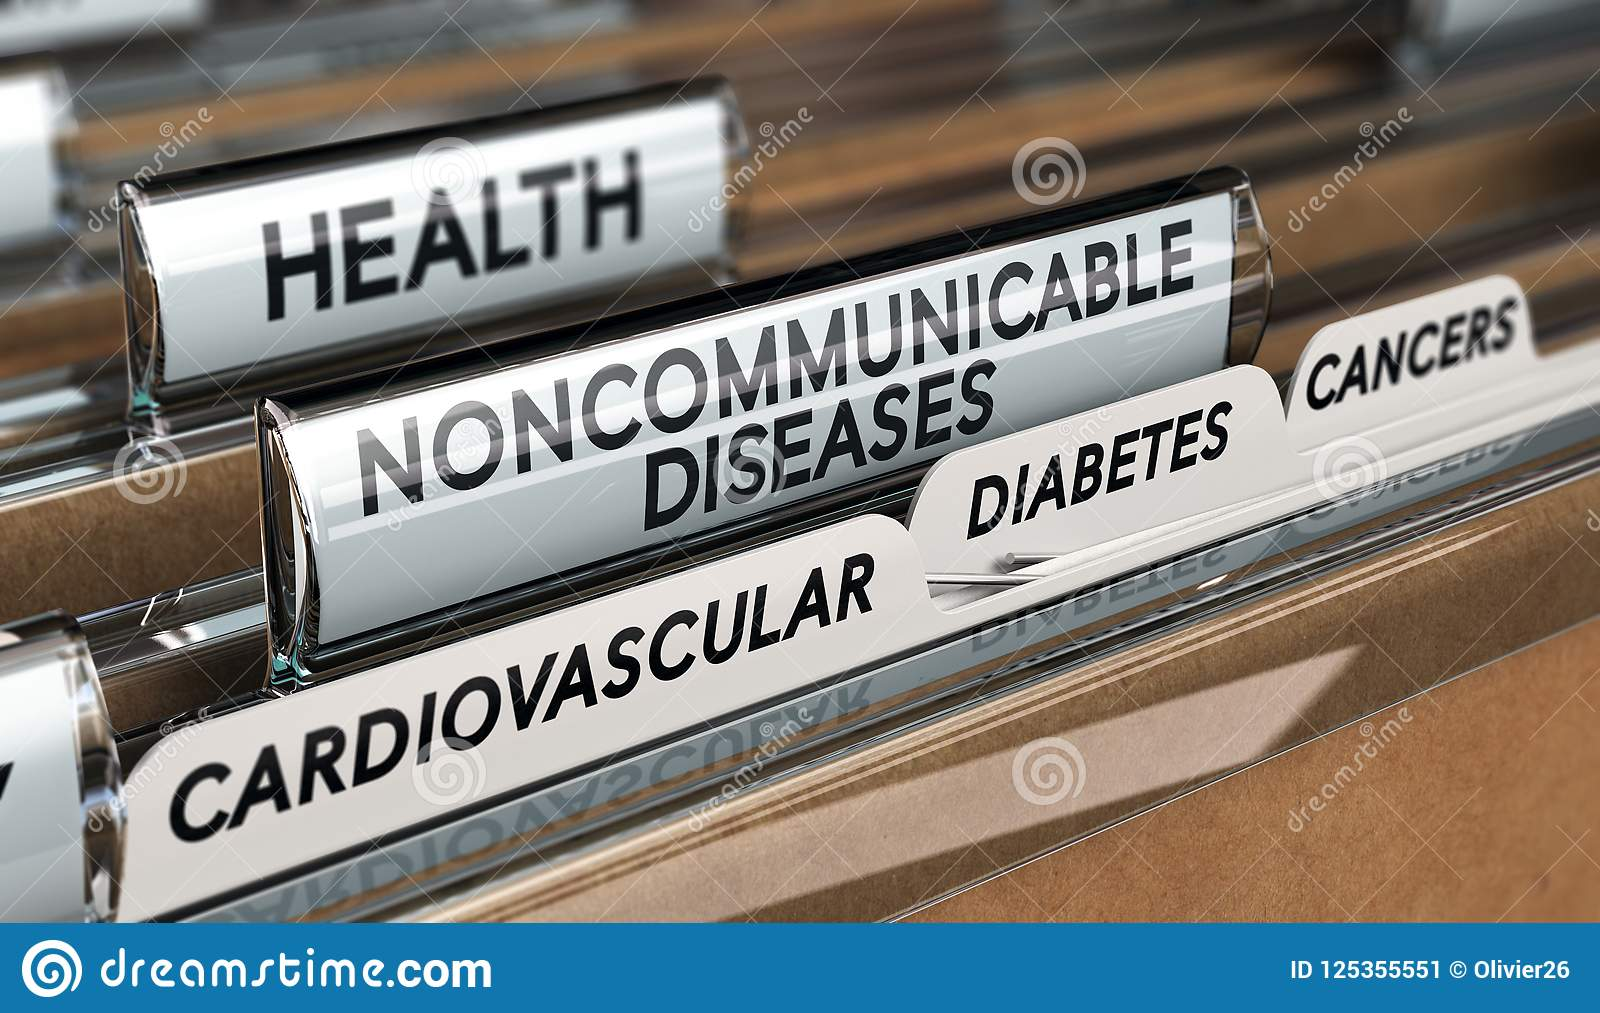 Noncommunicable Diseases List Stock Illustration